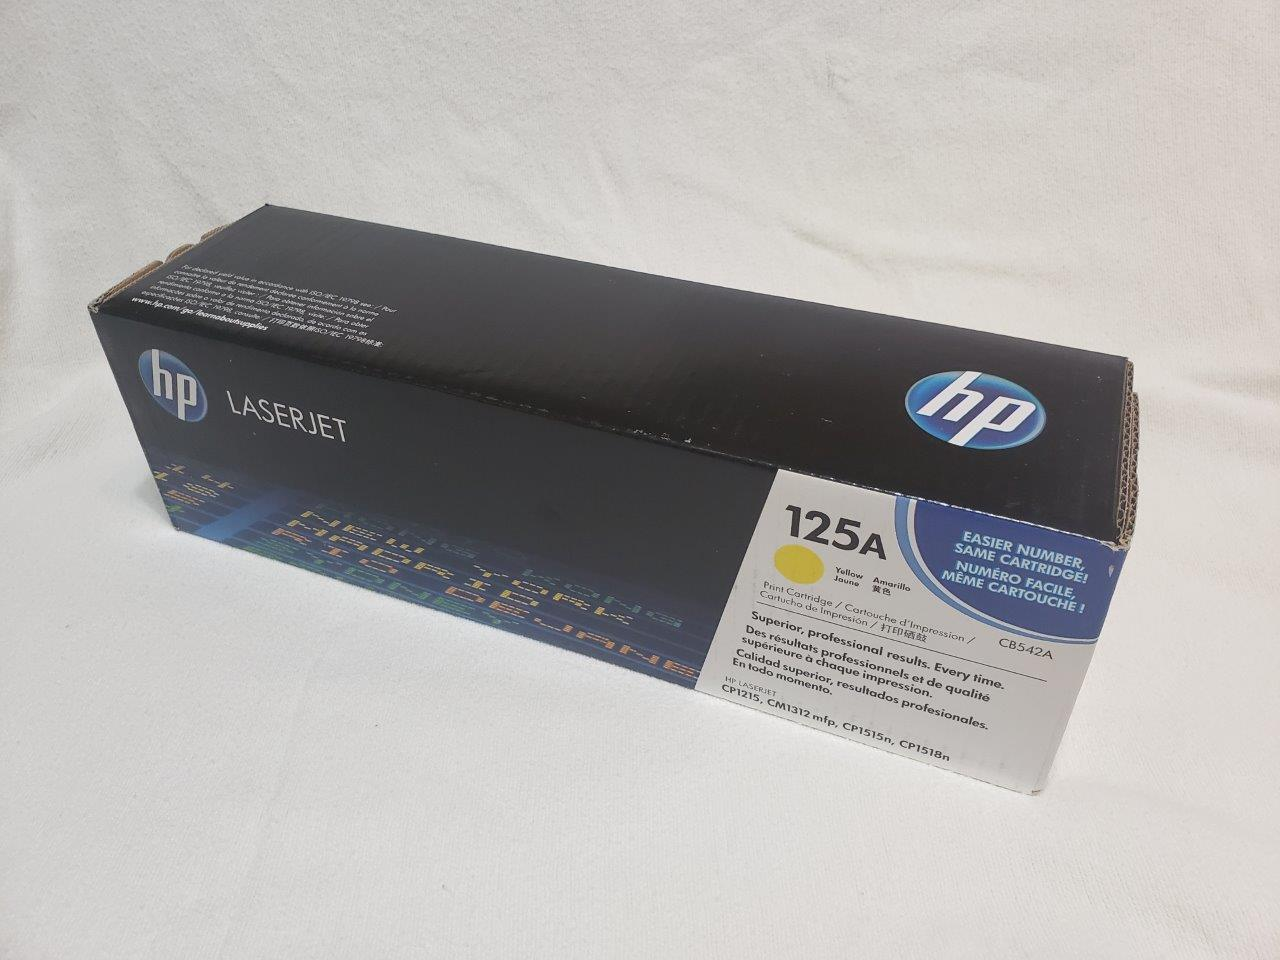 HP 125A Yellow Original LaserJet Toner Cartridge, CB542A Genuine Sealed for CM1312nfi CP1215 CP1518ni printers